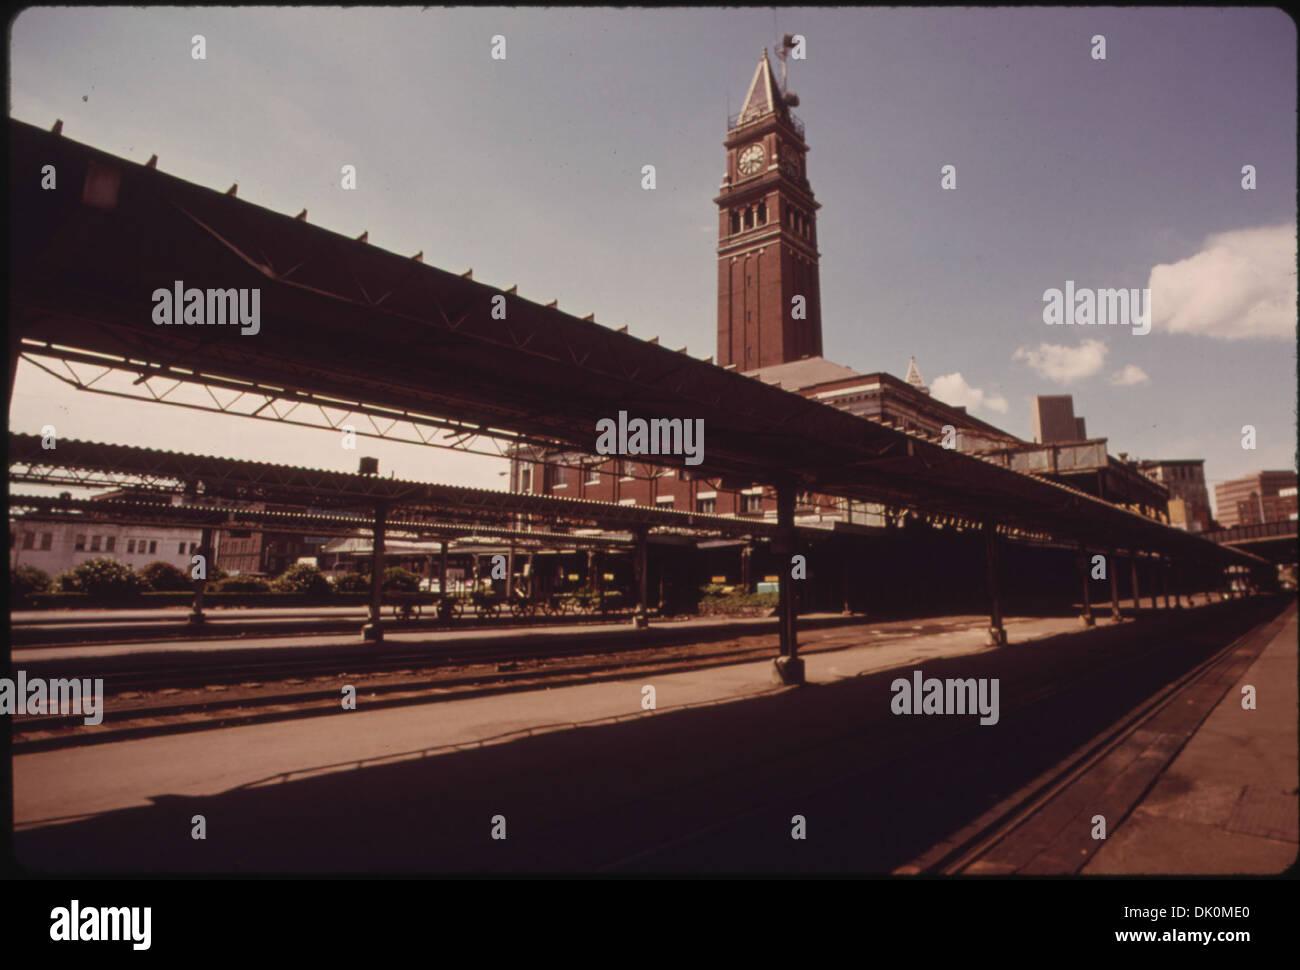 KING STREET PASSENGER TRAIN STATION IN SEATTLE, WASHINGTON HAS BEEN DESIGNATED AN HISTORICAL LANDMARK. AMTRAK IS... 556125 - Stock Image